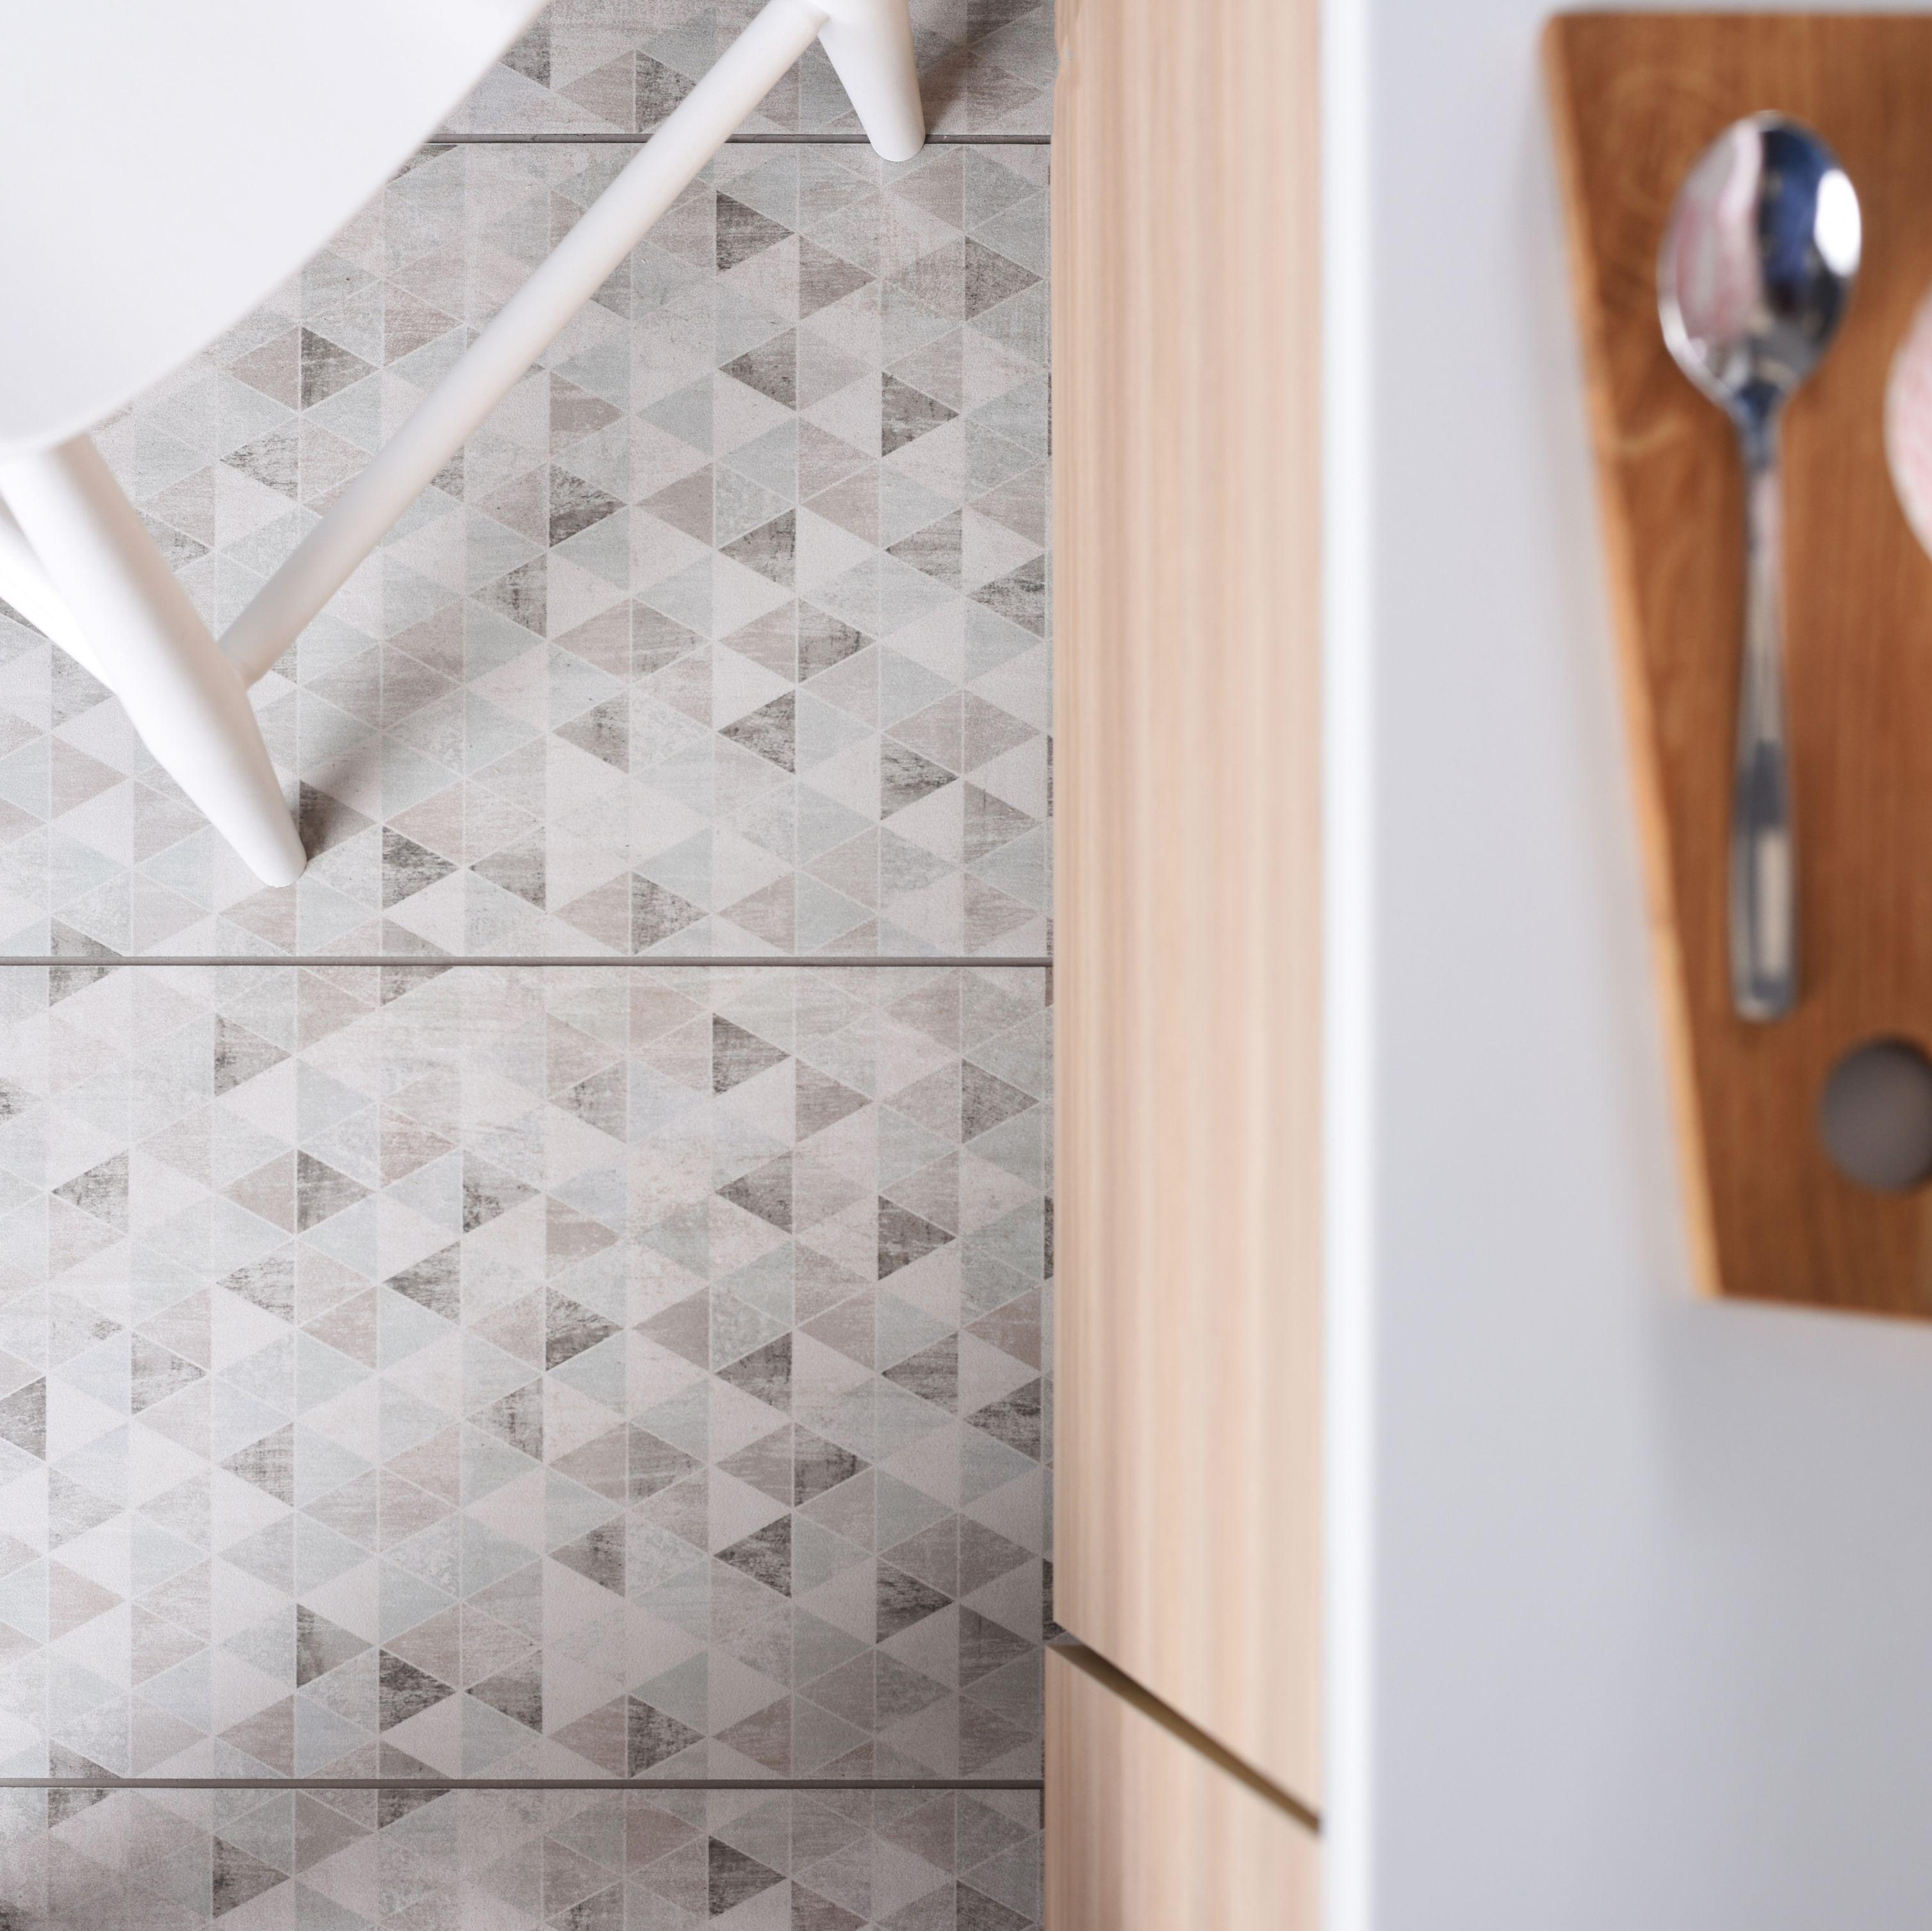 Kalme Tegels Met Driehoekjes Tegels Witte Lambrisering Vloertegels